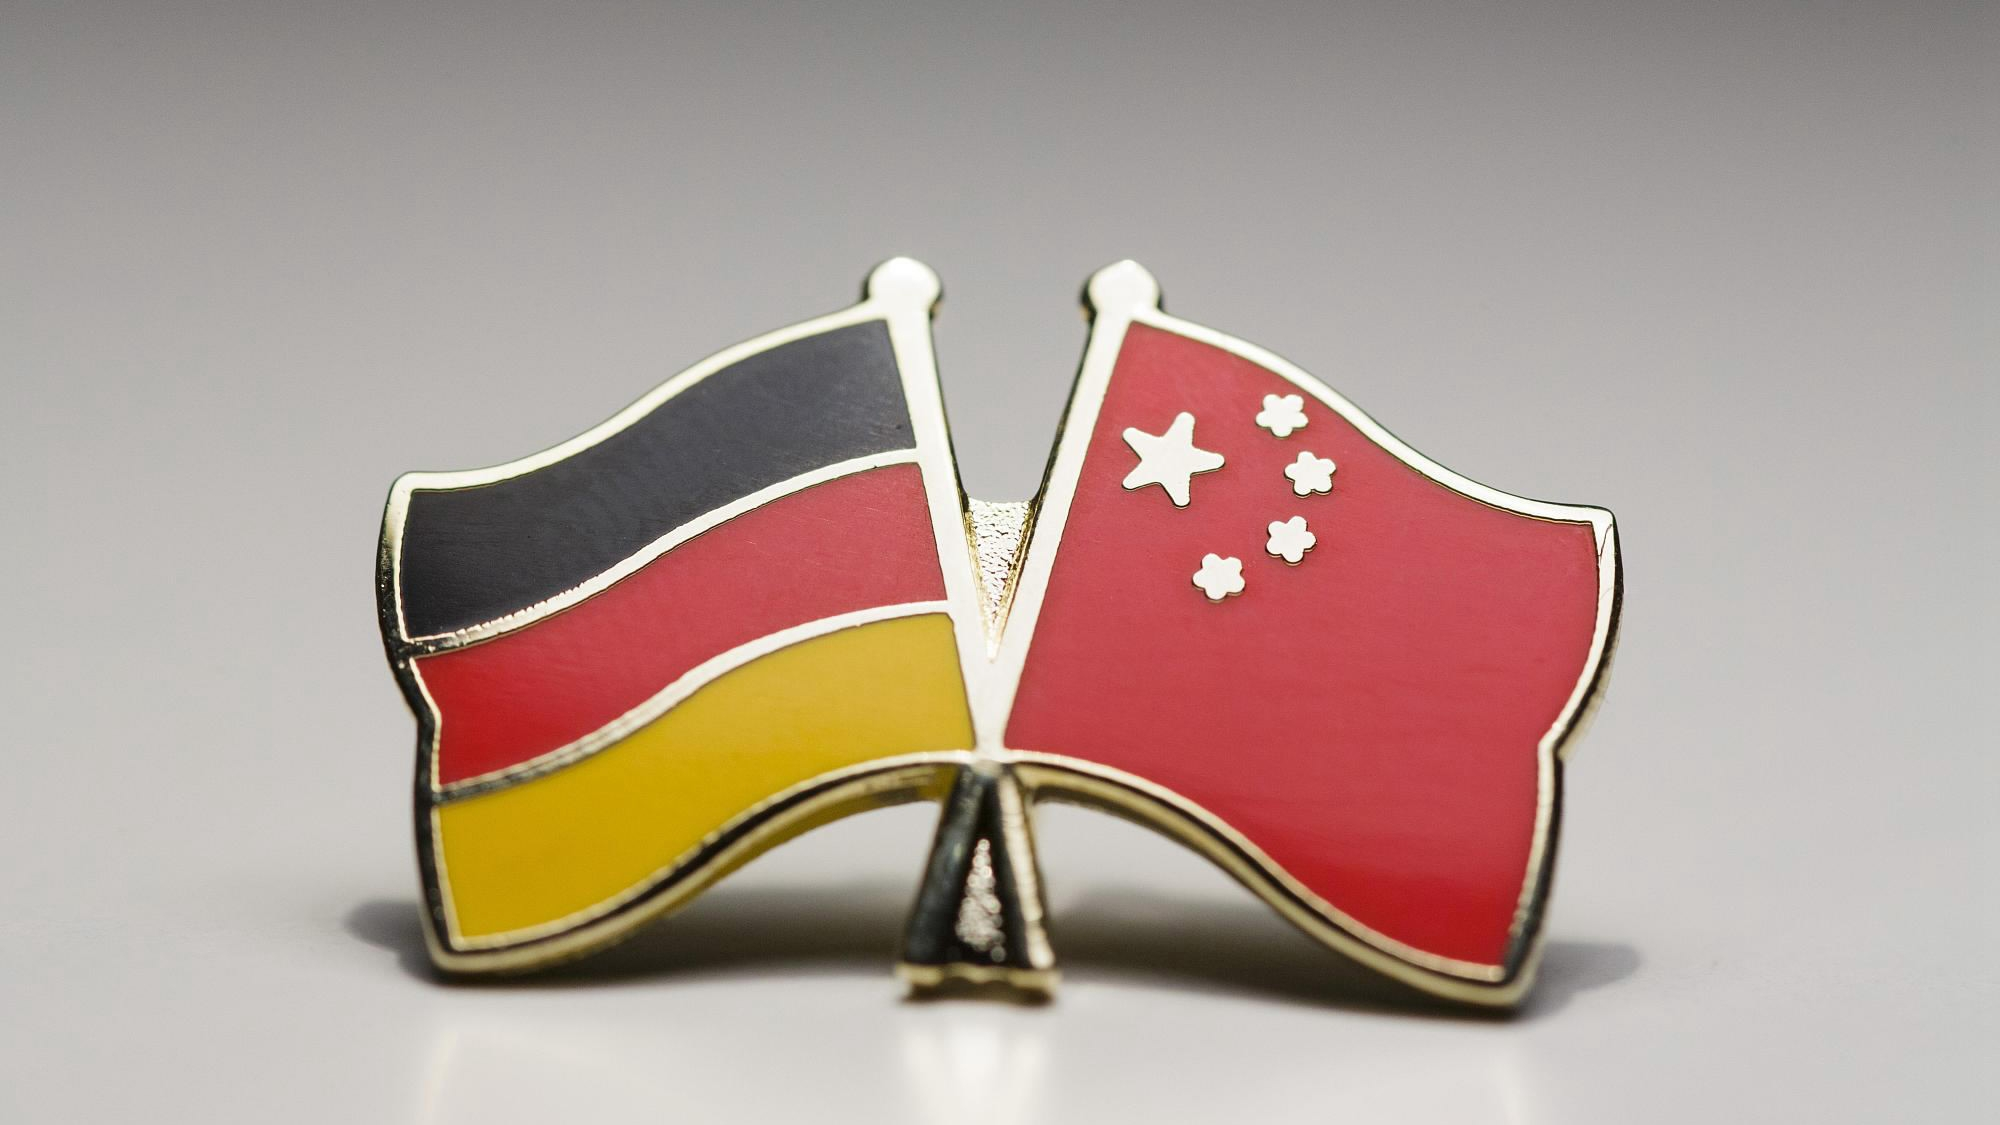 Chinese Premier Li, Germany's Merkel to hold video meeting on Thursday